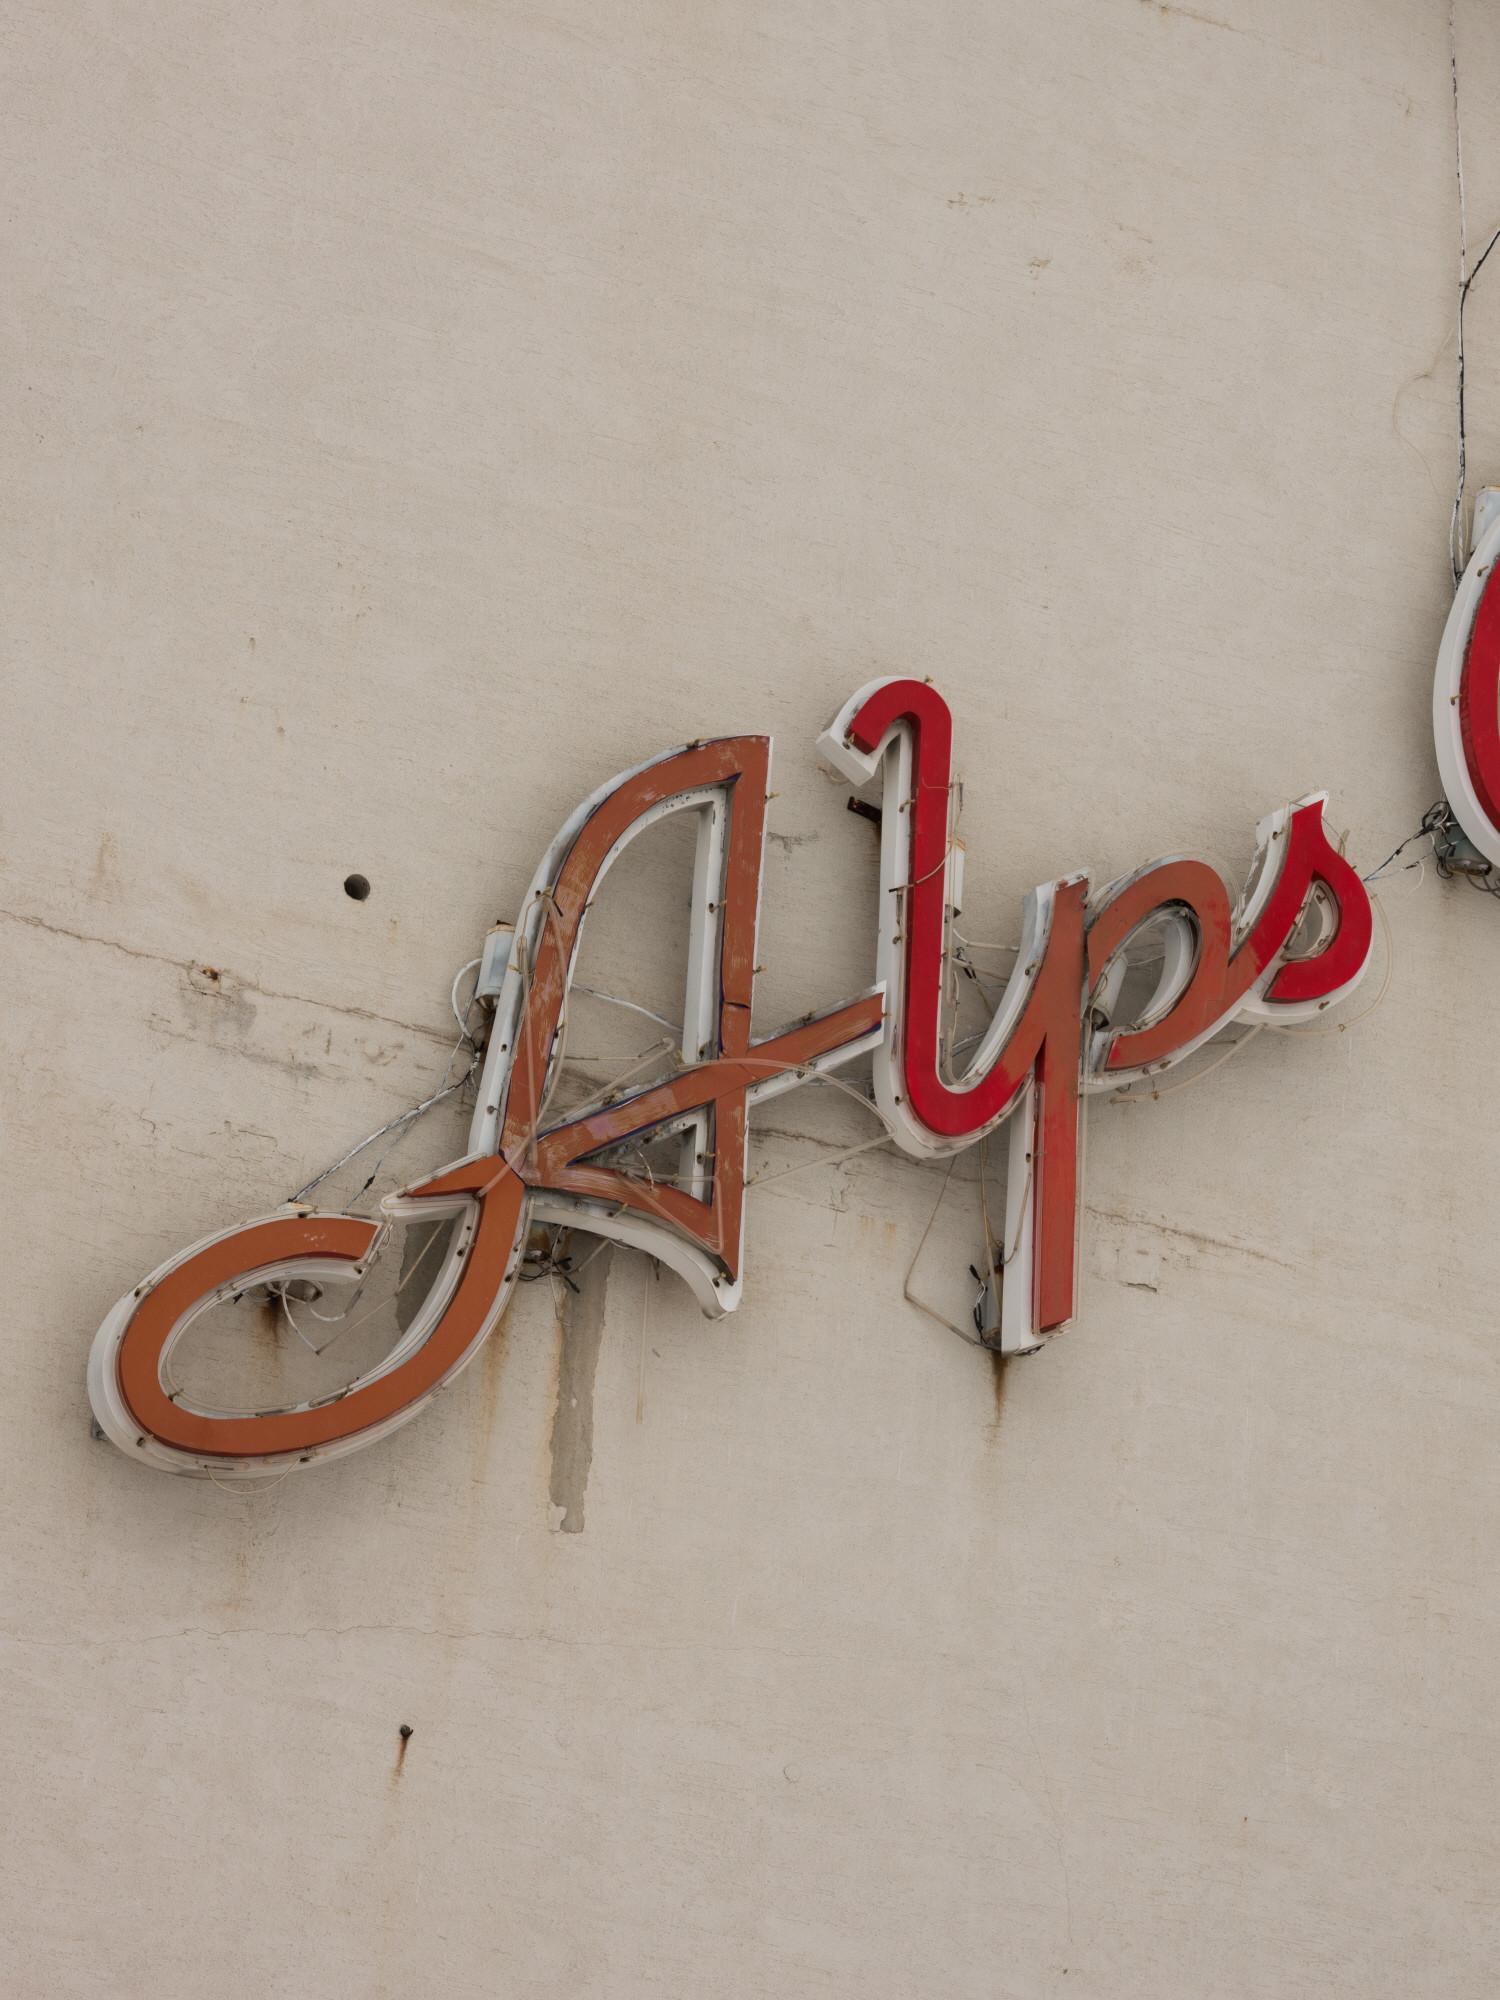 ALPS_#03.jpg